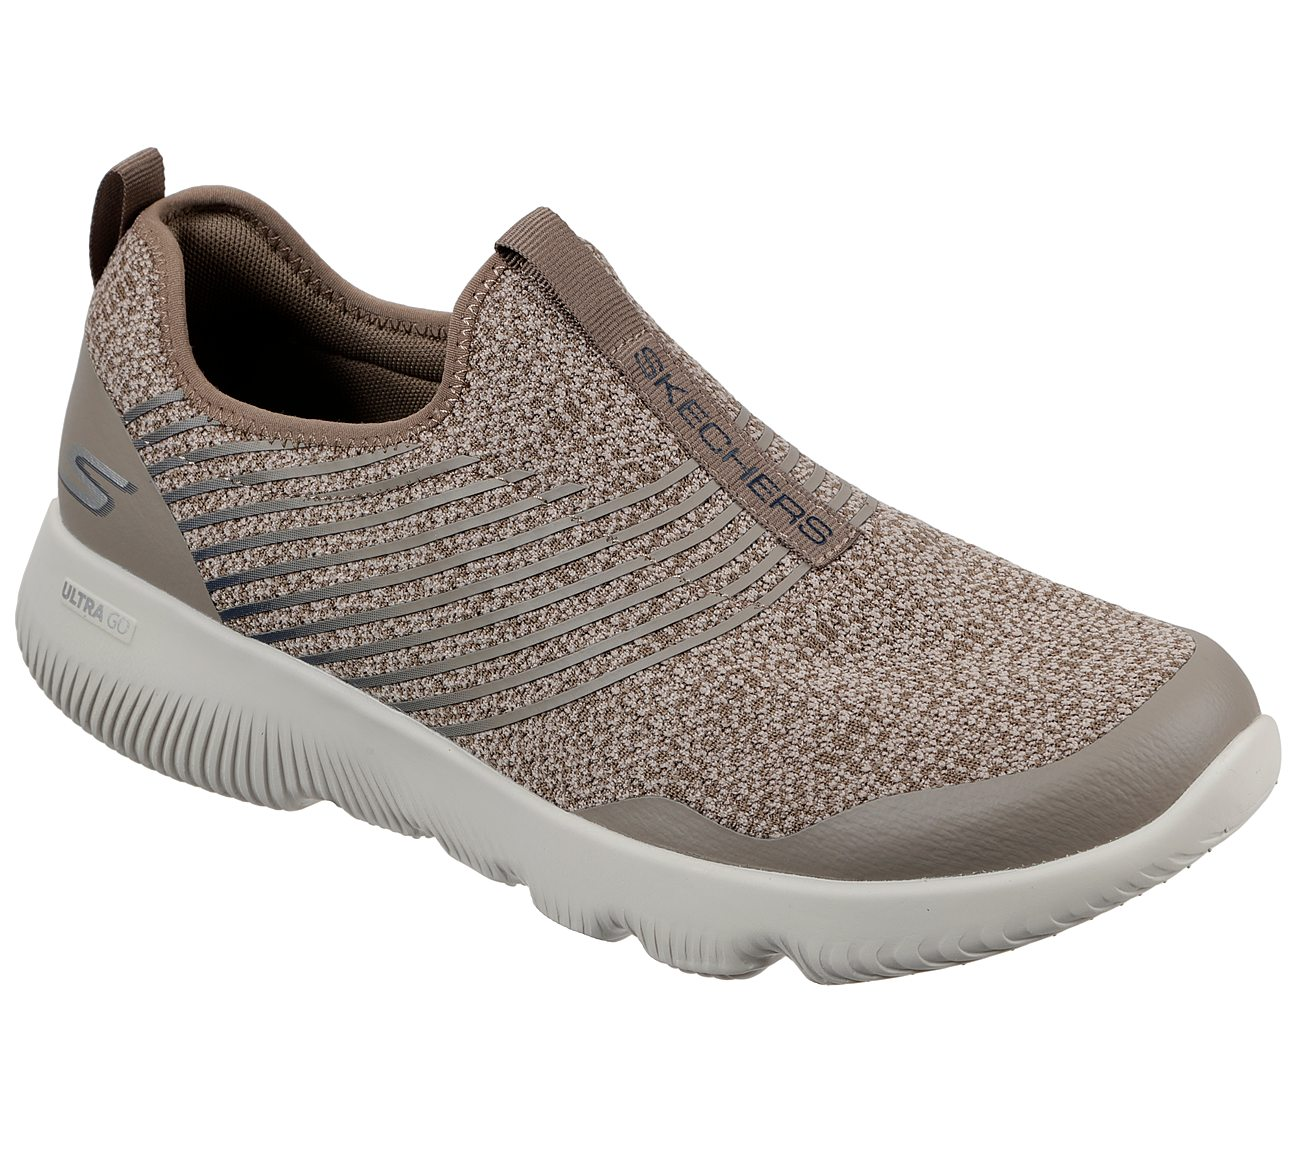 Buy Skechers Skechers Gorun Focus Raptor Skechers Performance Shoes Only 70 00